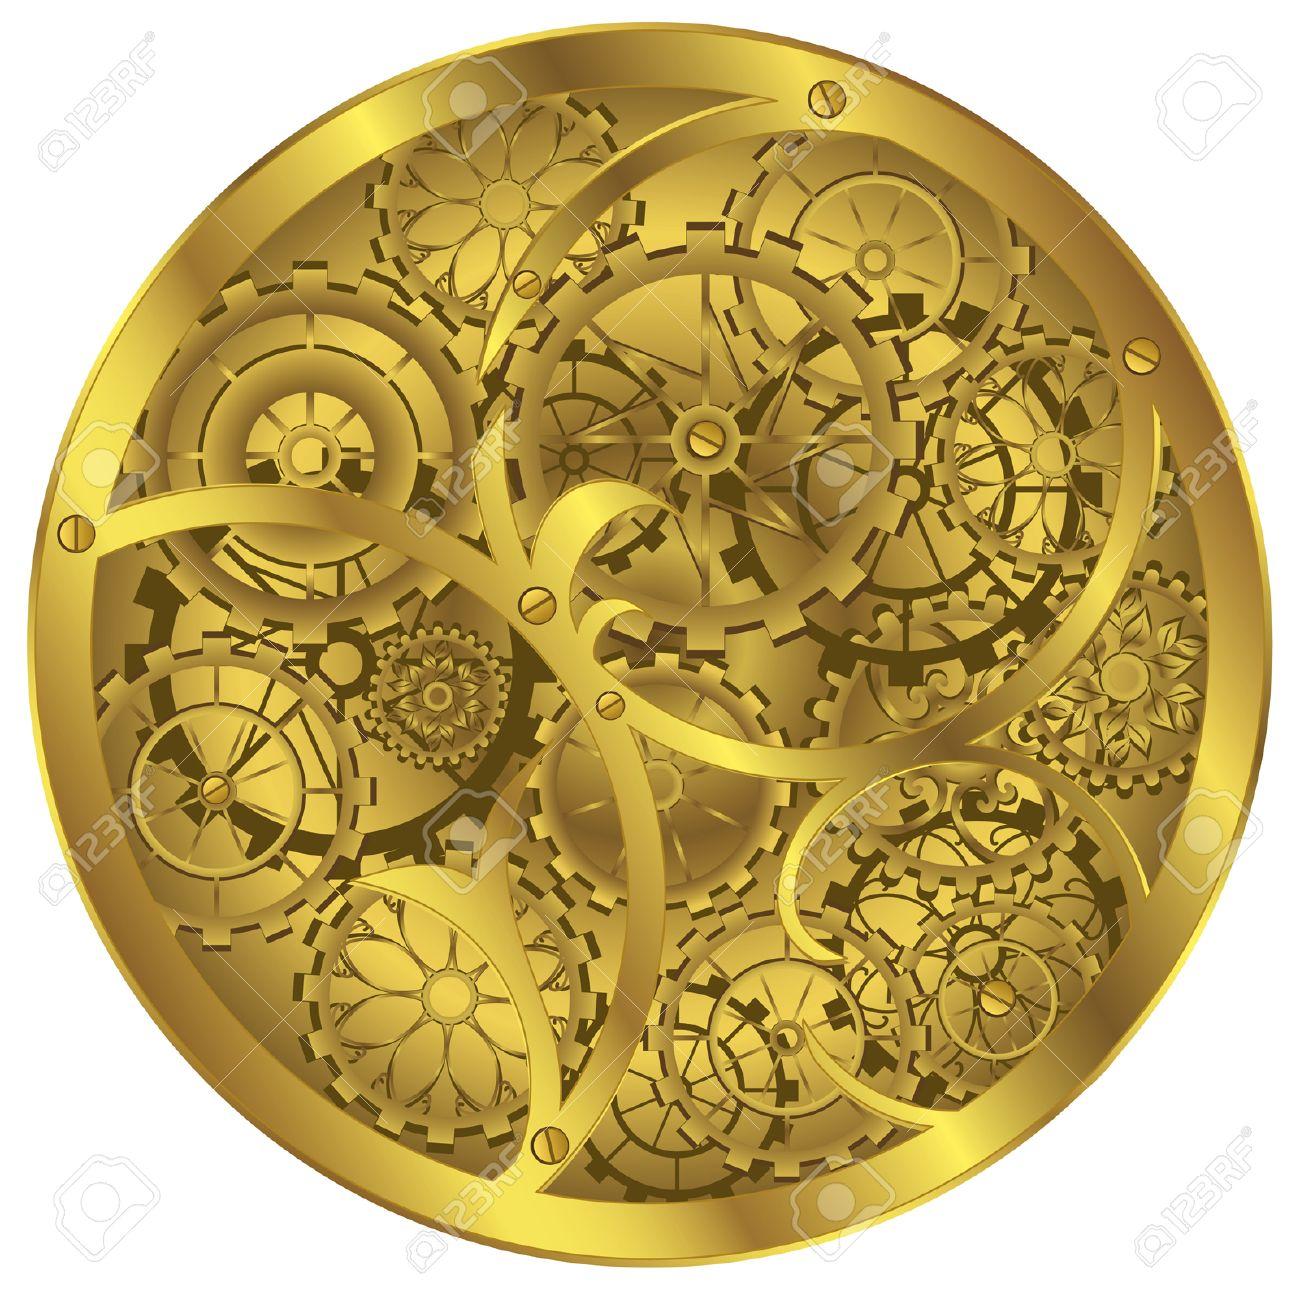 Clockworks clipart #11